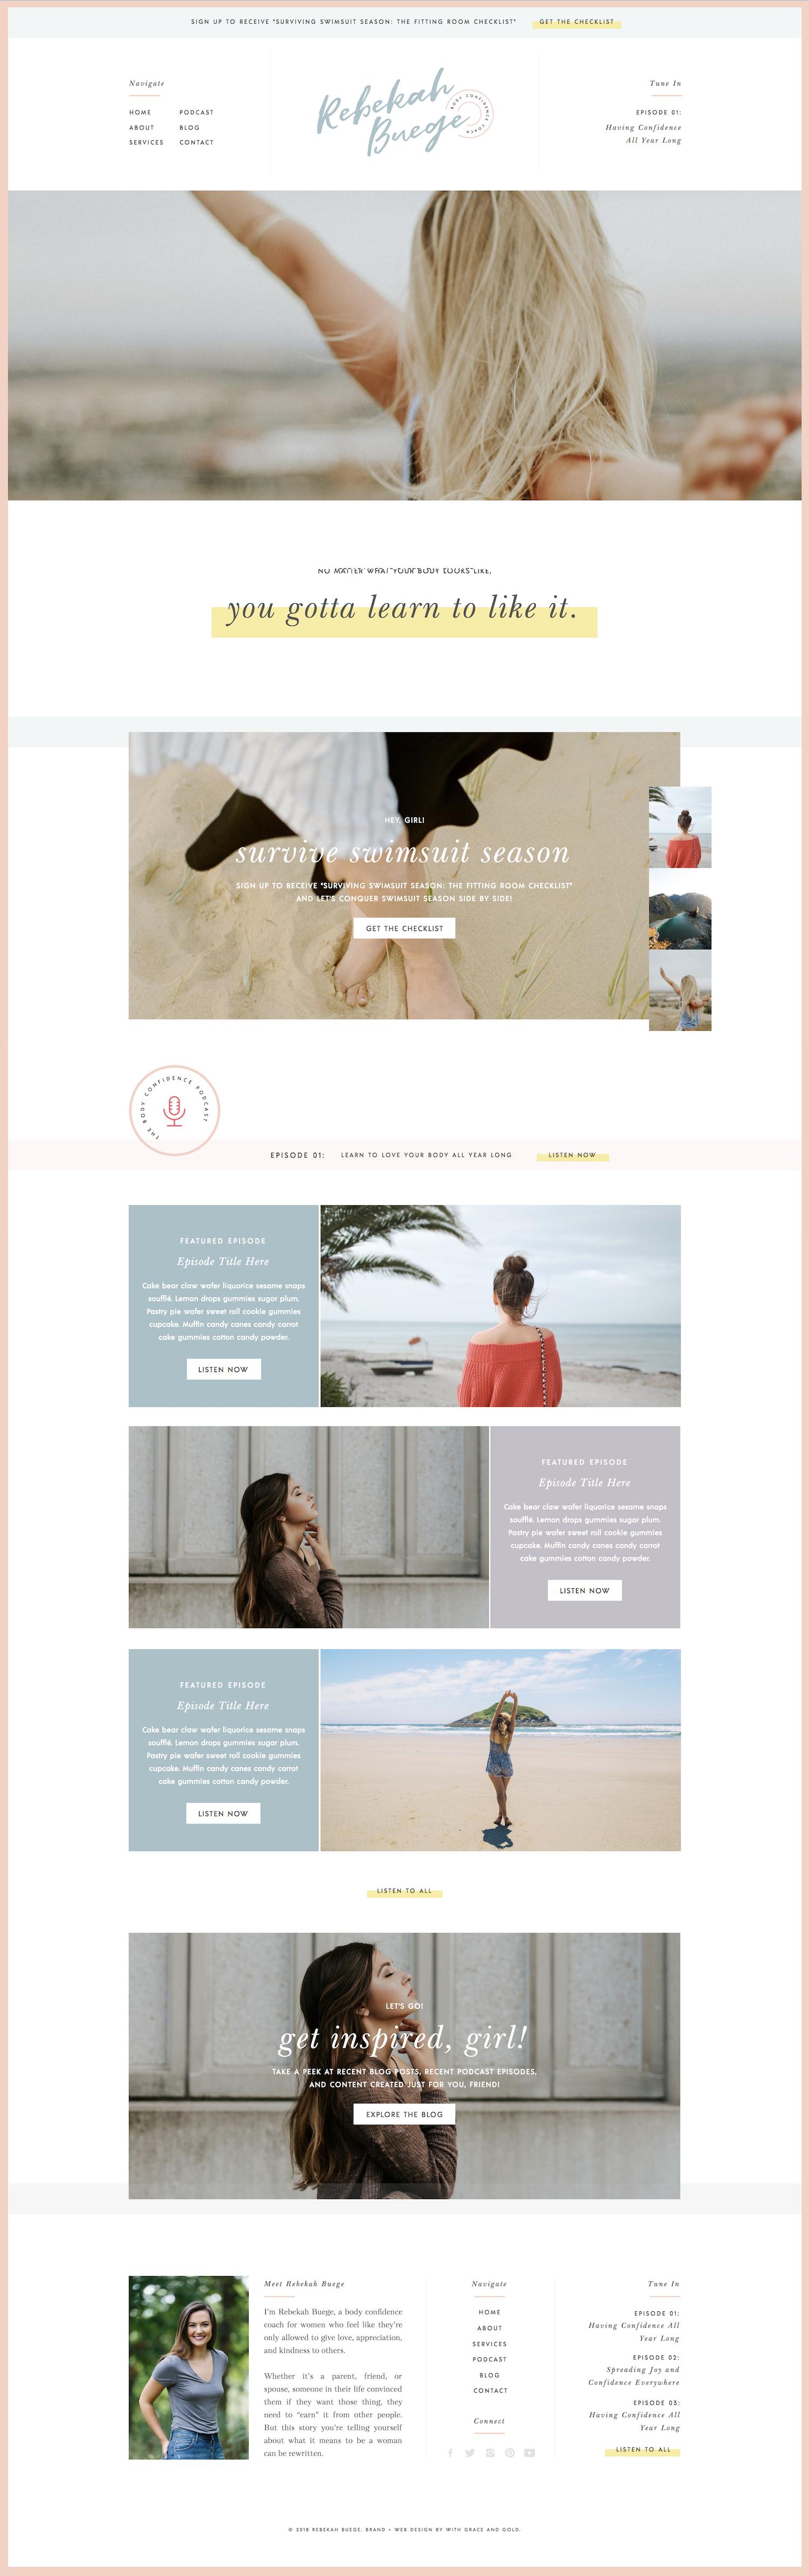 Logo Design And Web Design For Rebekah Buege With Grace And Gold Branding Web Design And Education Simple Website Design Web Design Marketing Web Design